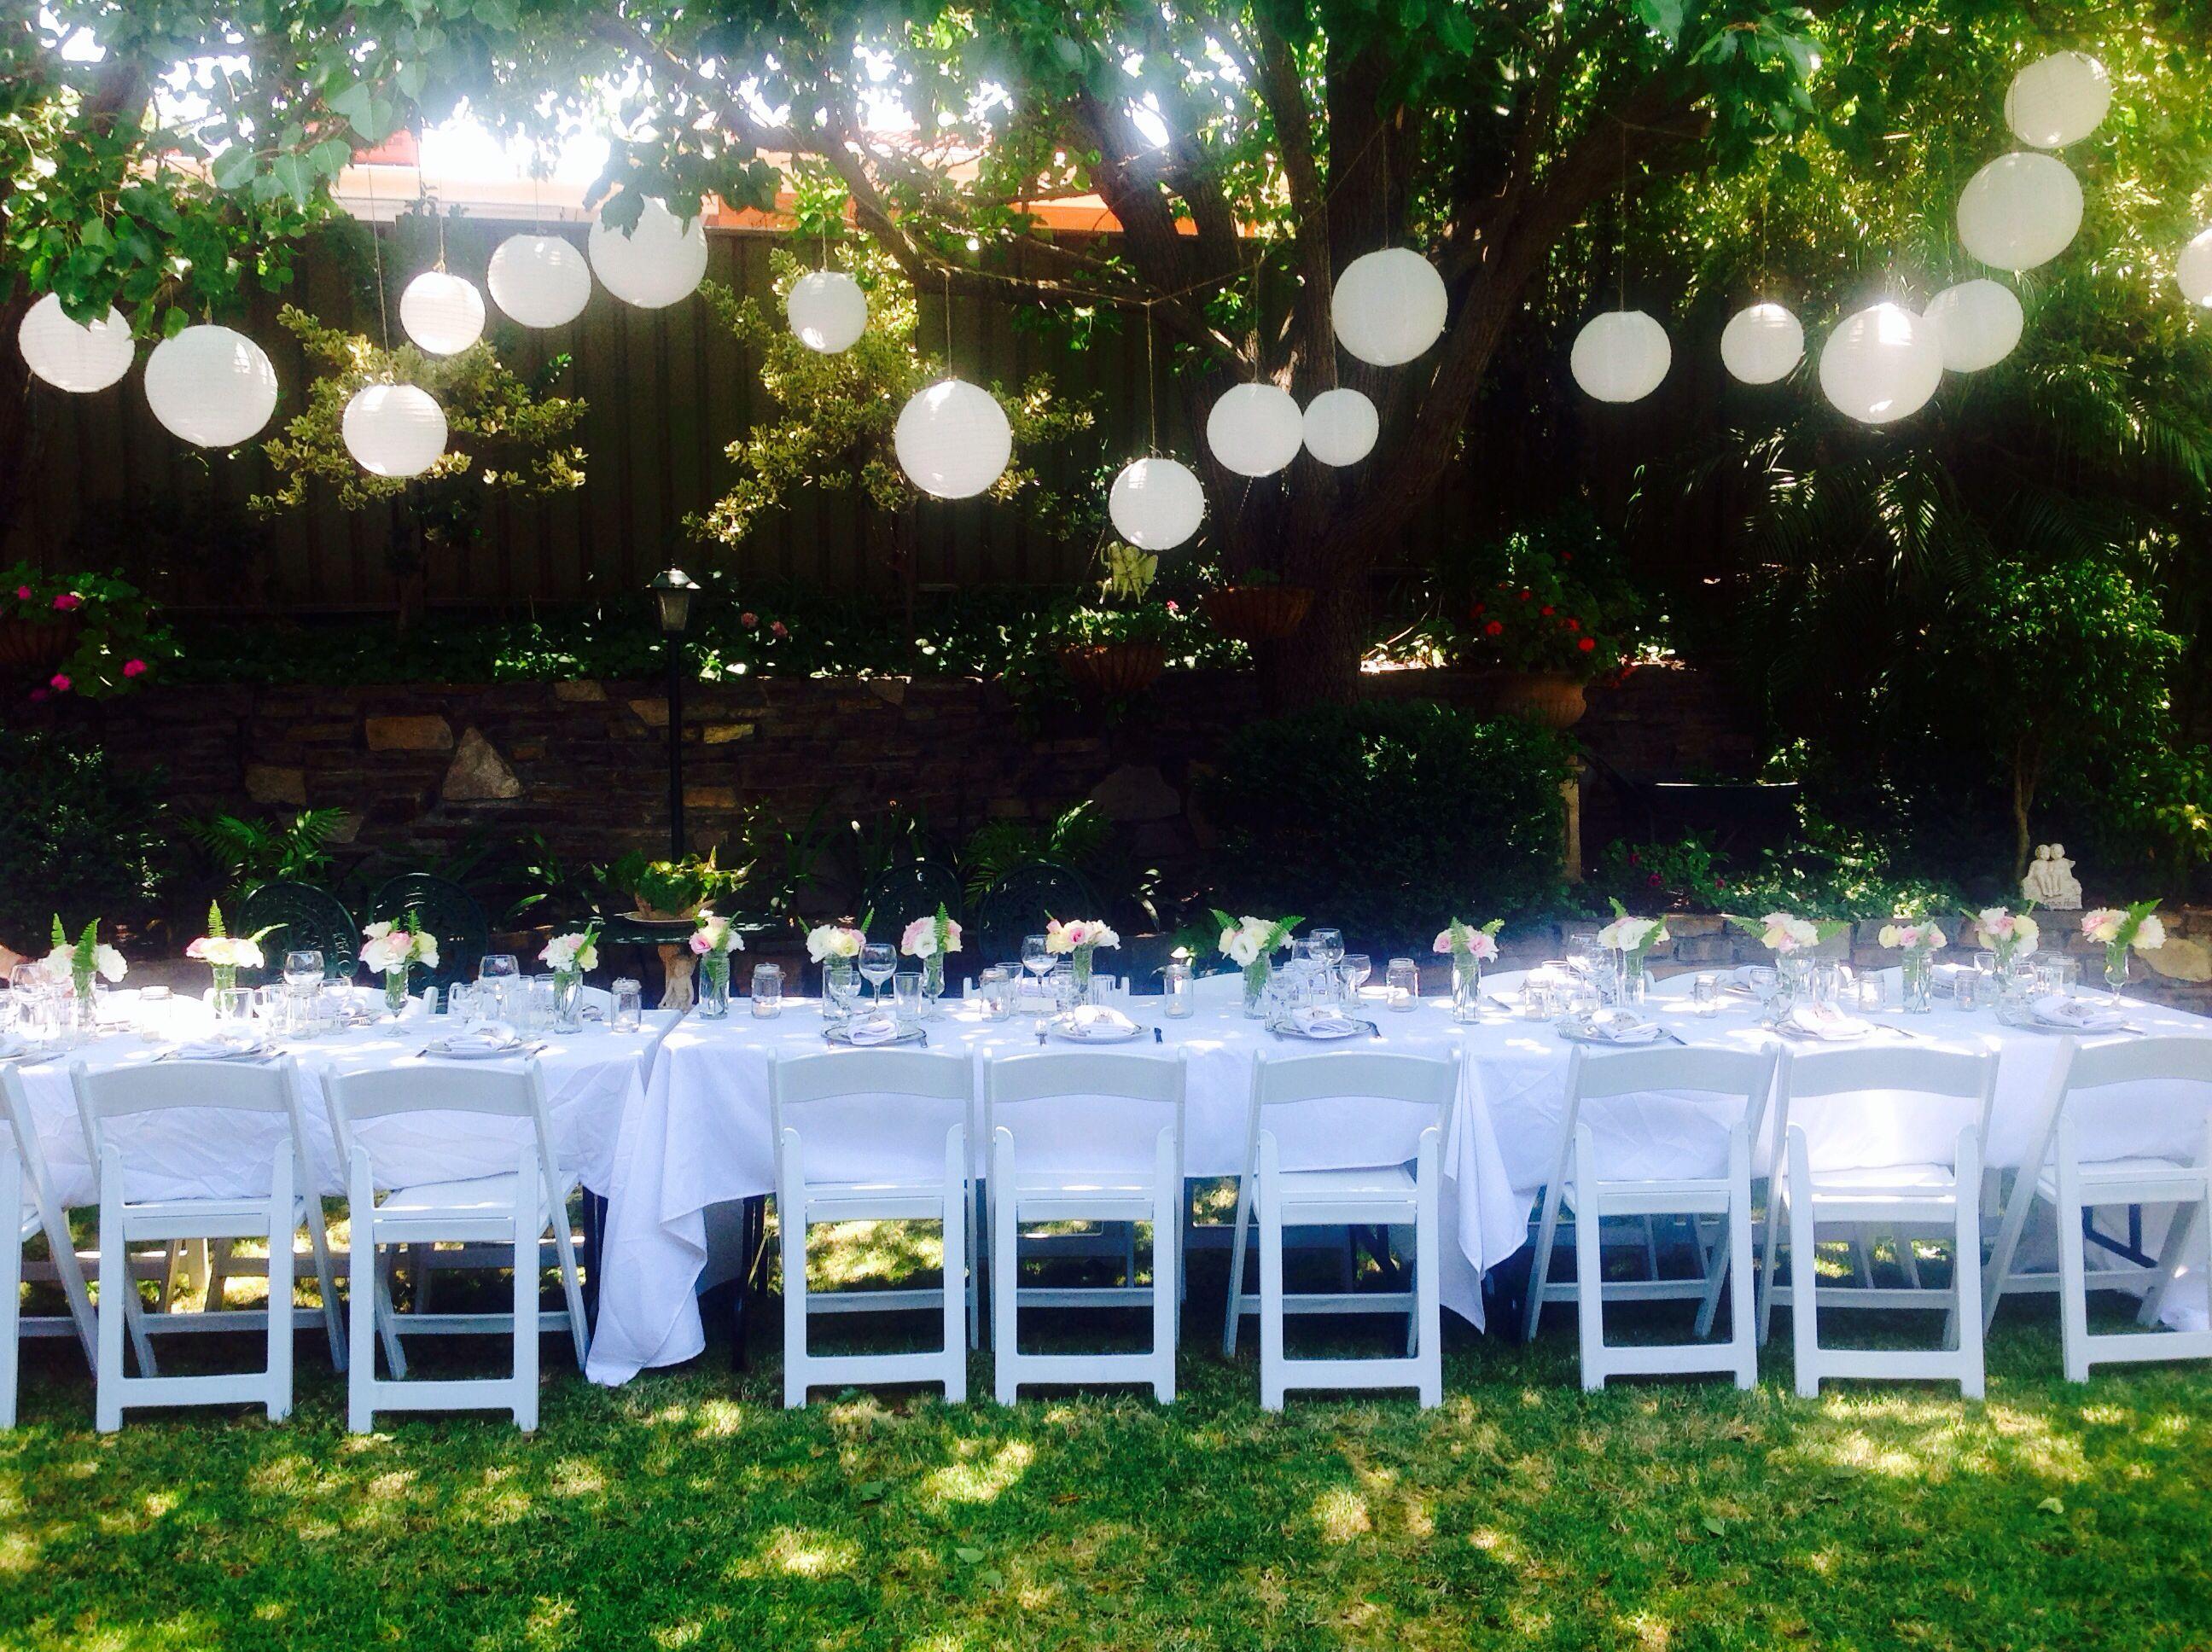 My Garden engagement party decor! | Engagement Party ideas ...